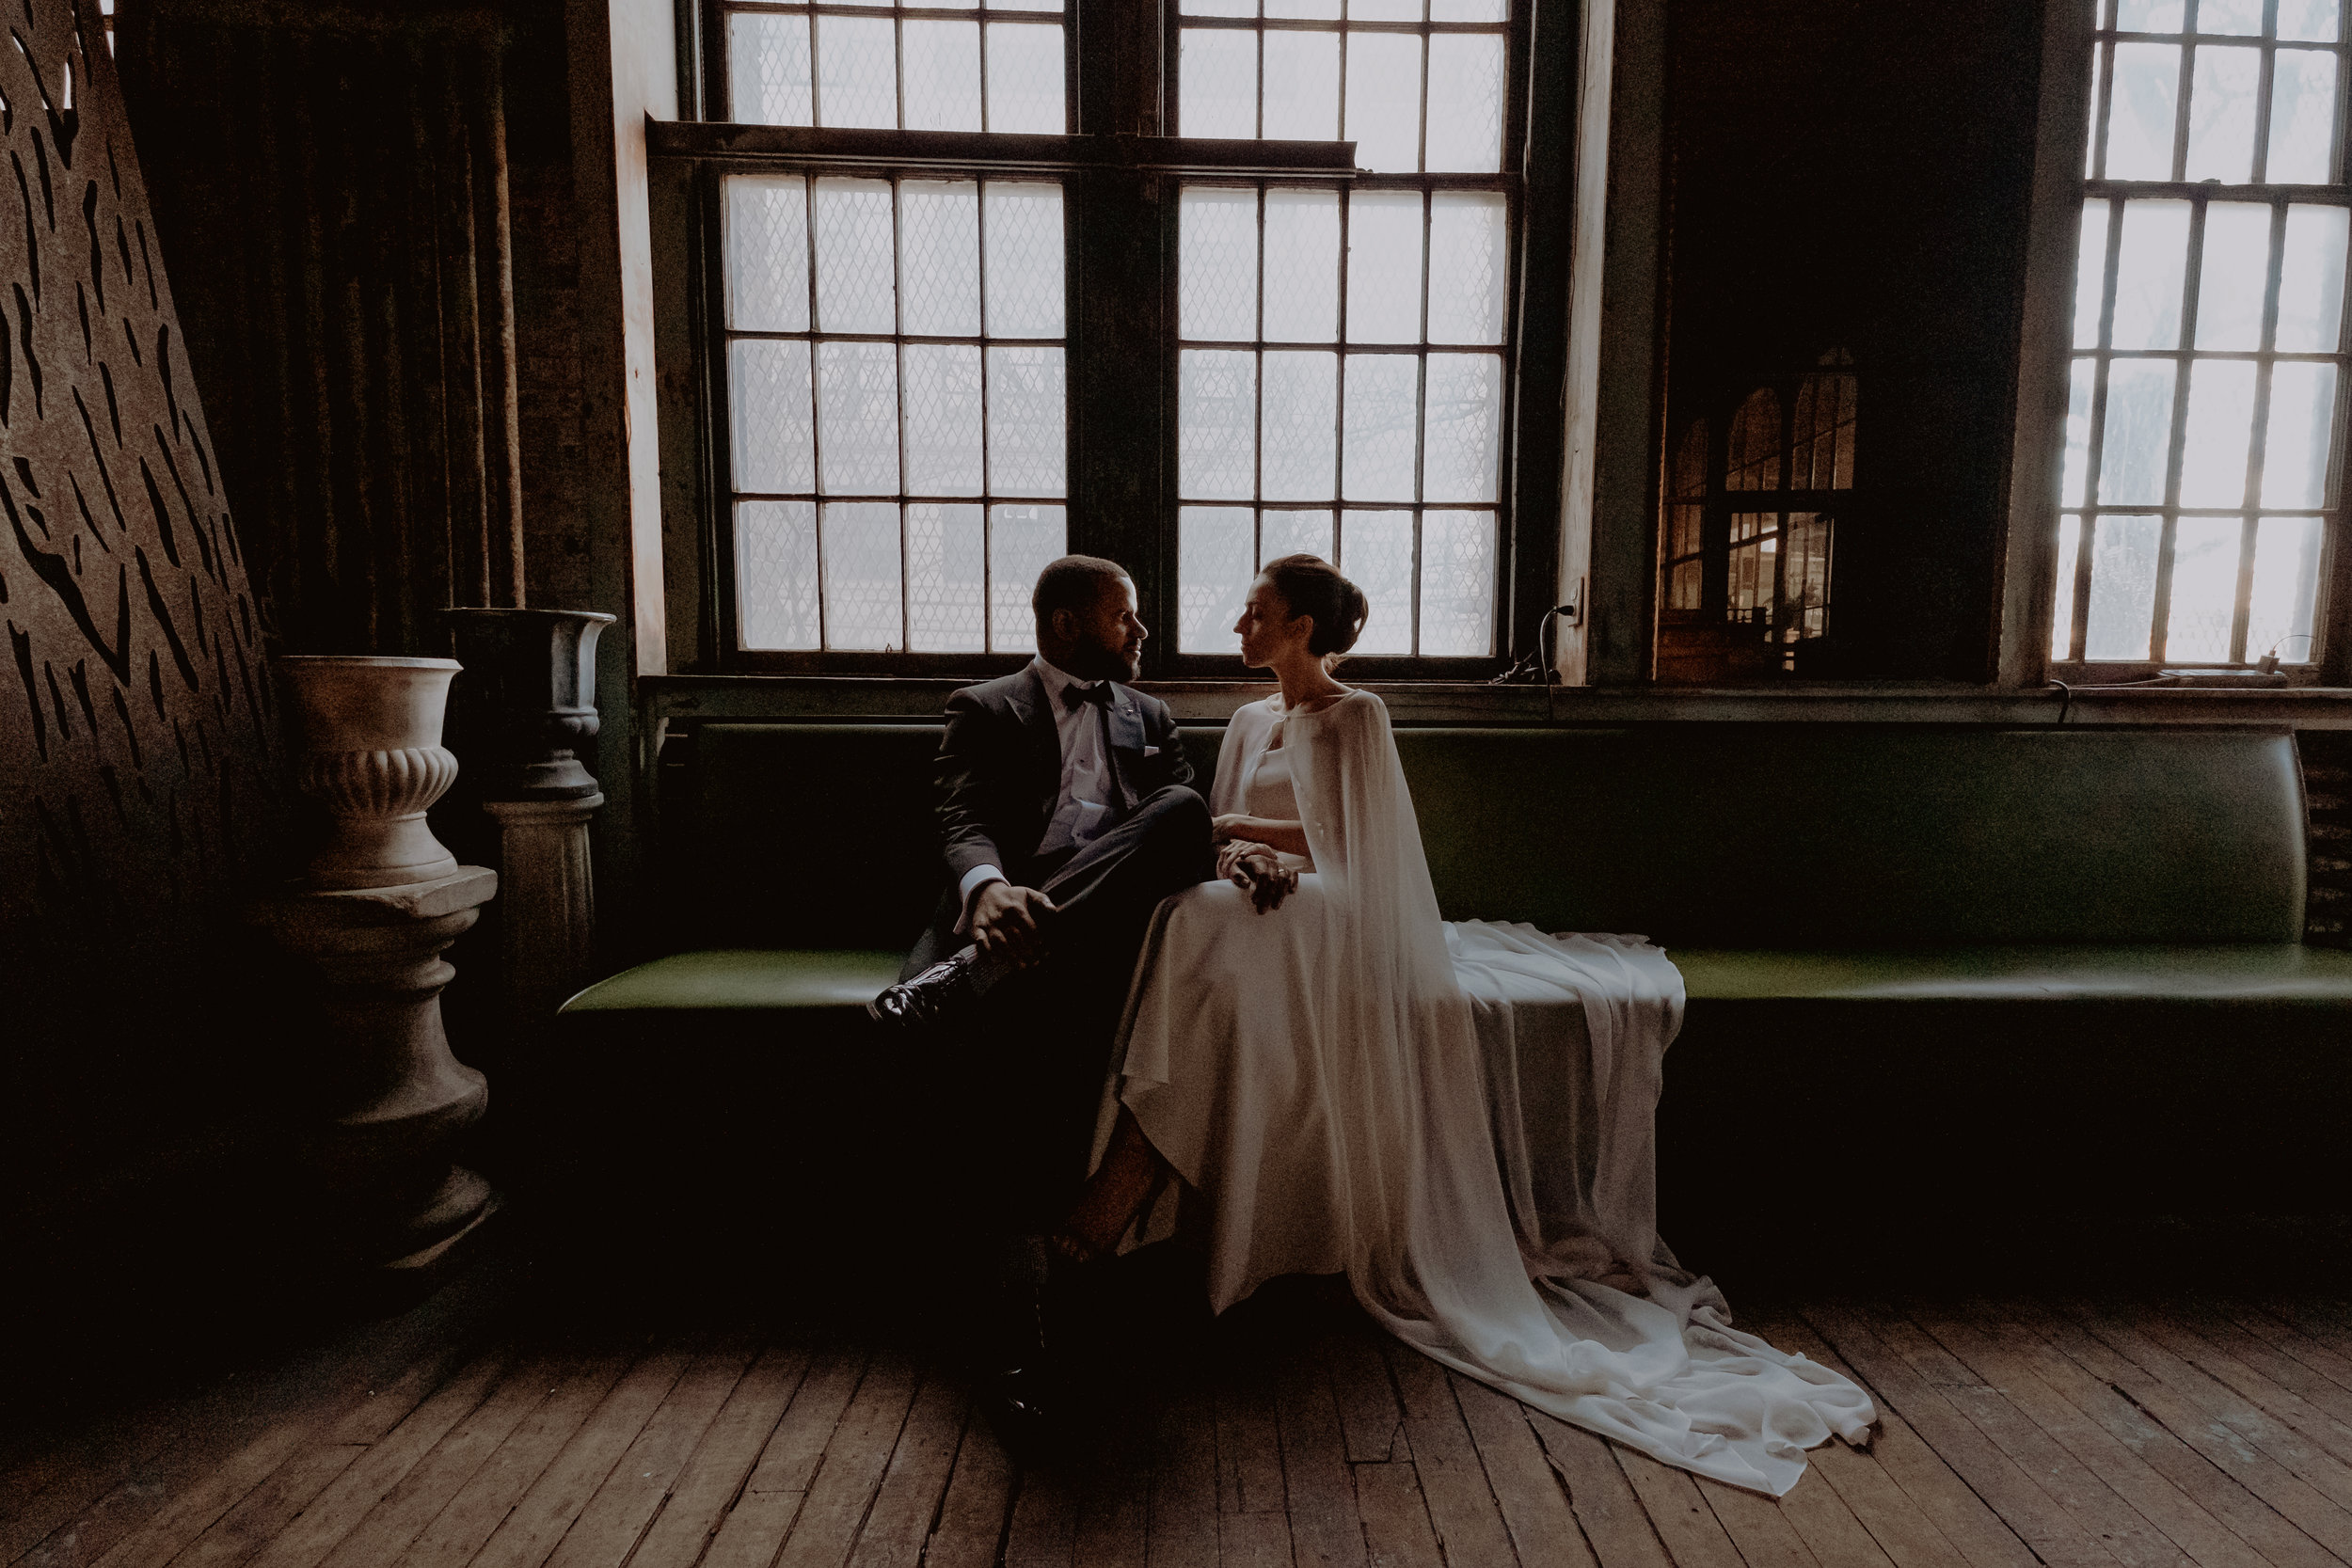 Metropolitan_Building_Wedding_DemaineandMike_Brooklyn_Wedding_Photographer_Chellise_Michael_Photography-397.jpg